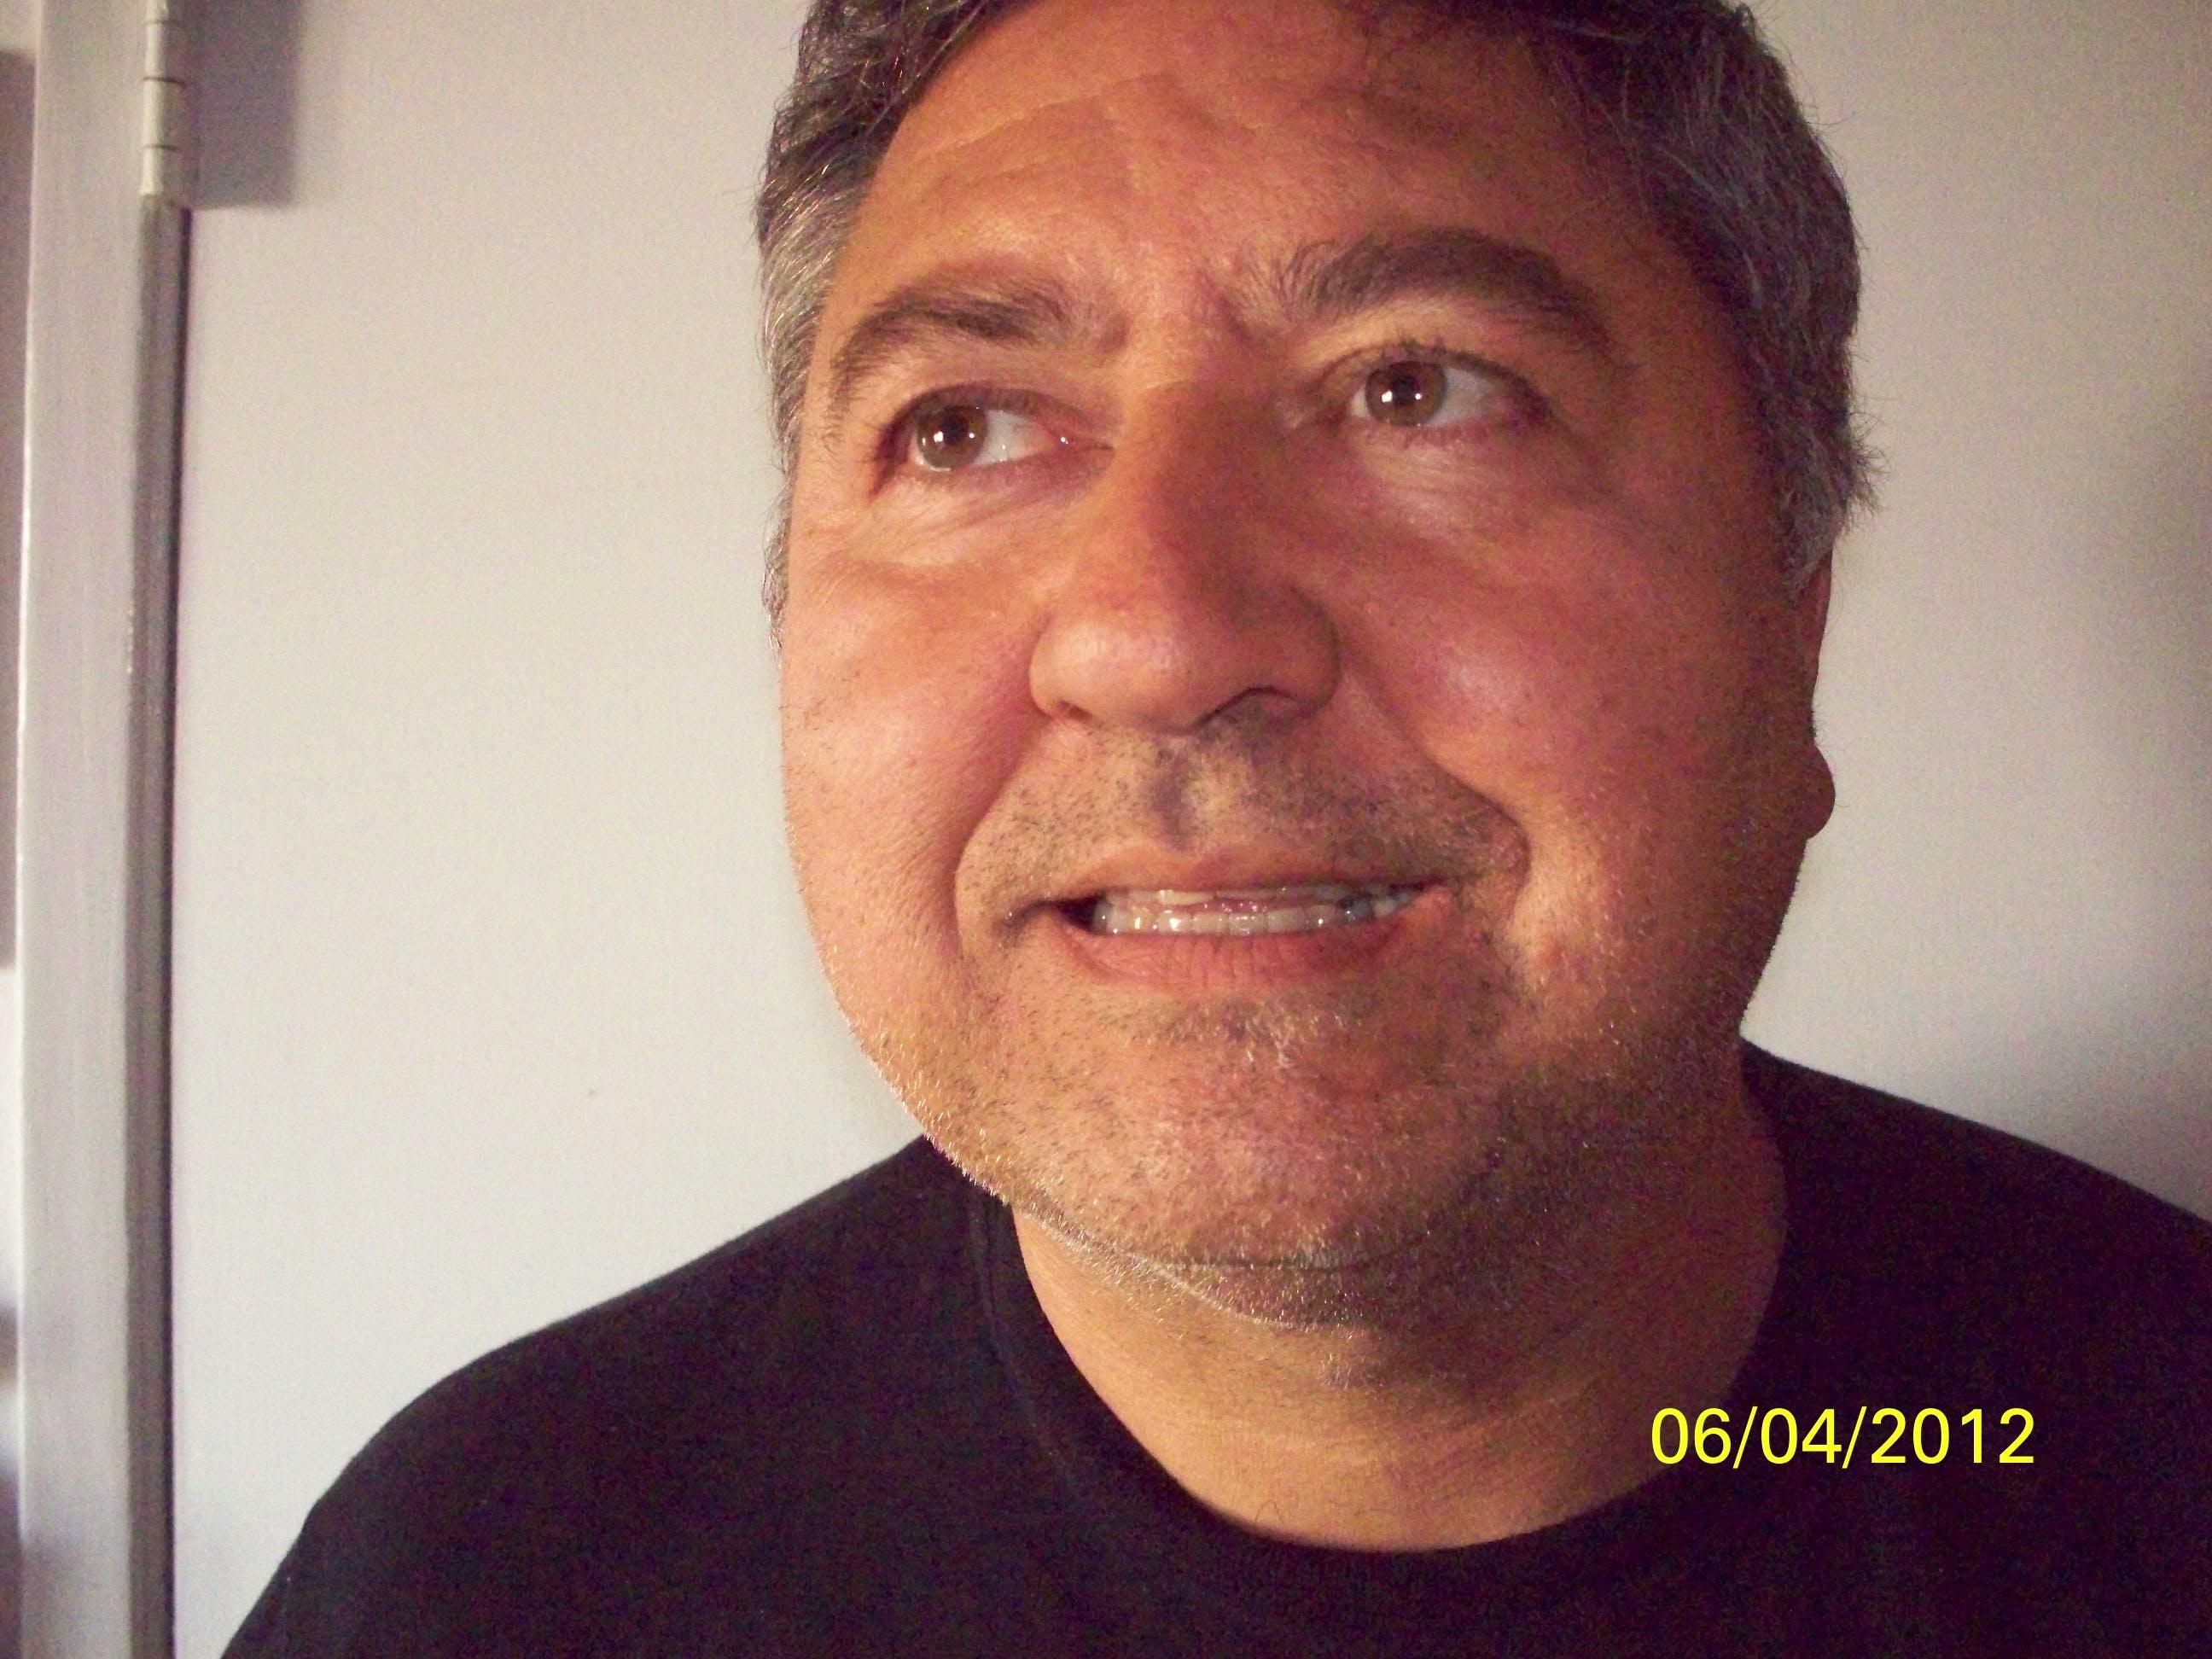 Mauricio Chamat